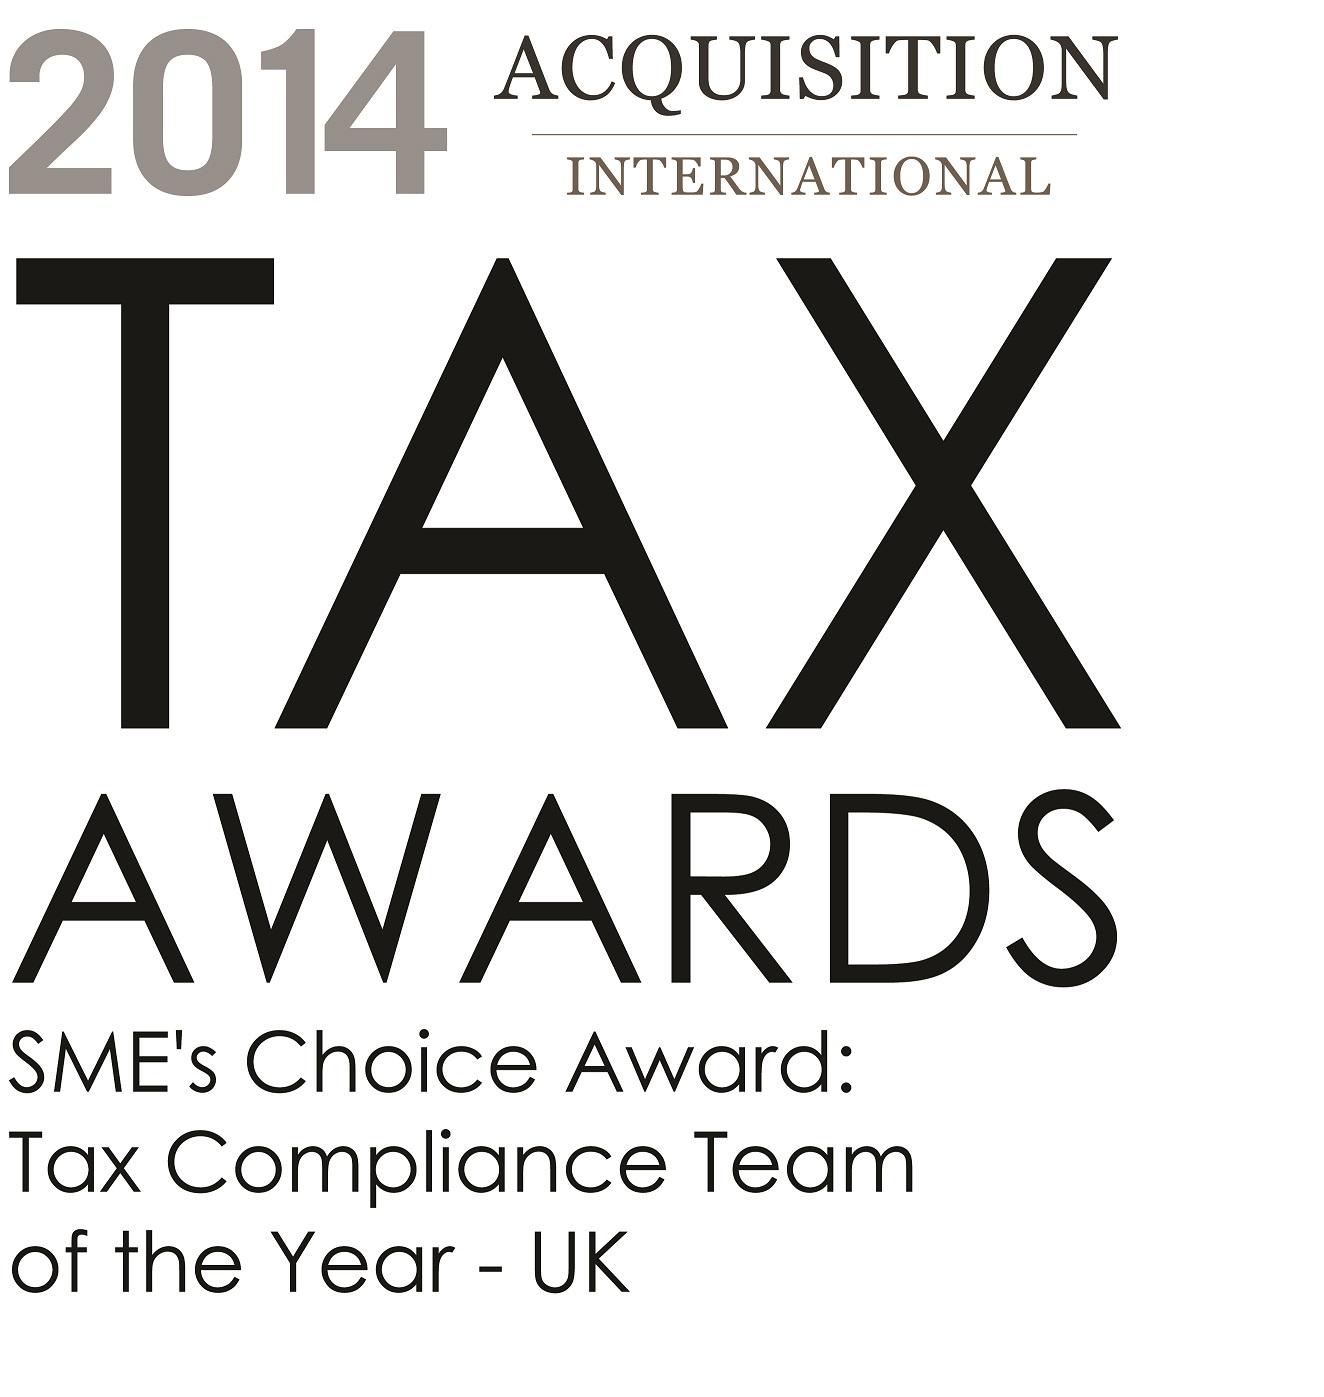 2014 SME's Choice Award